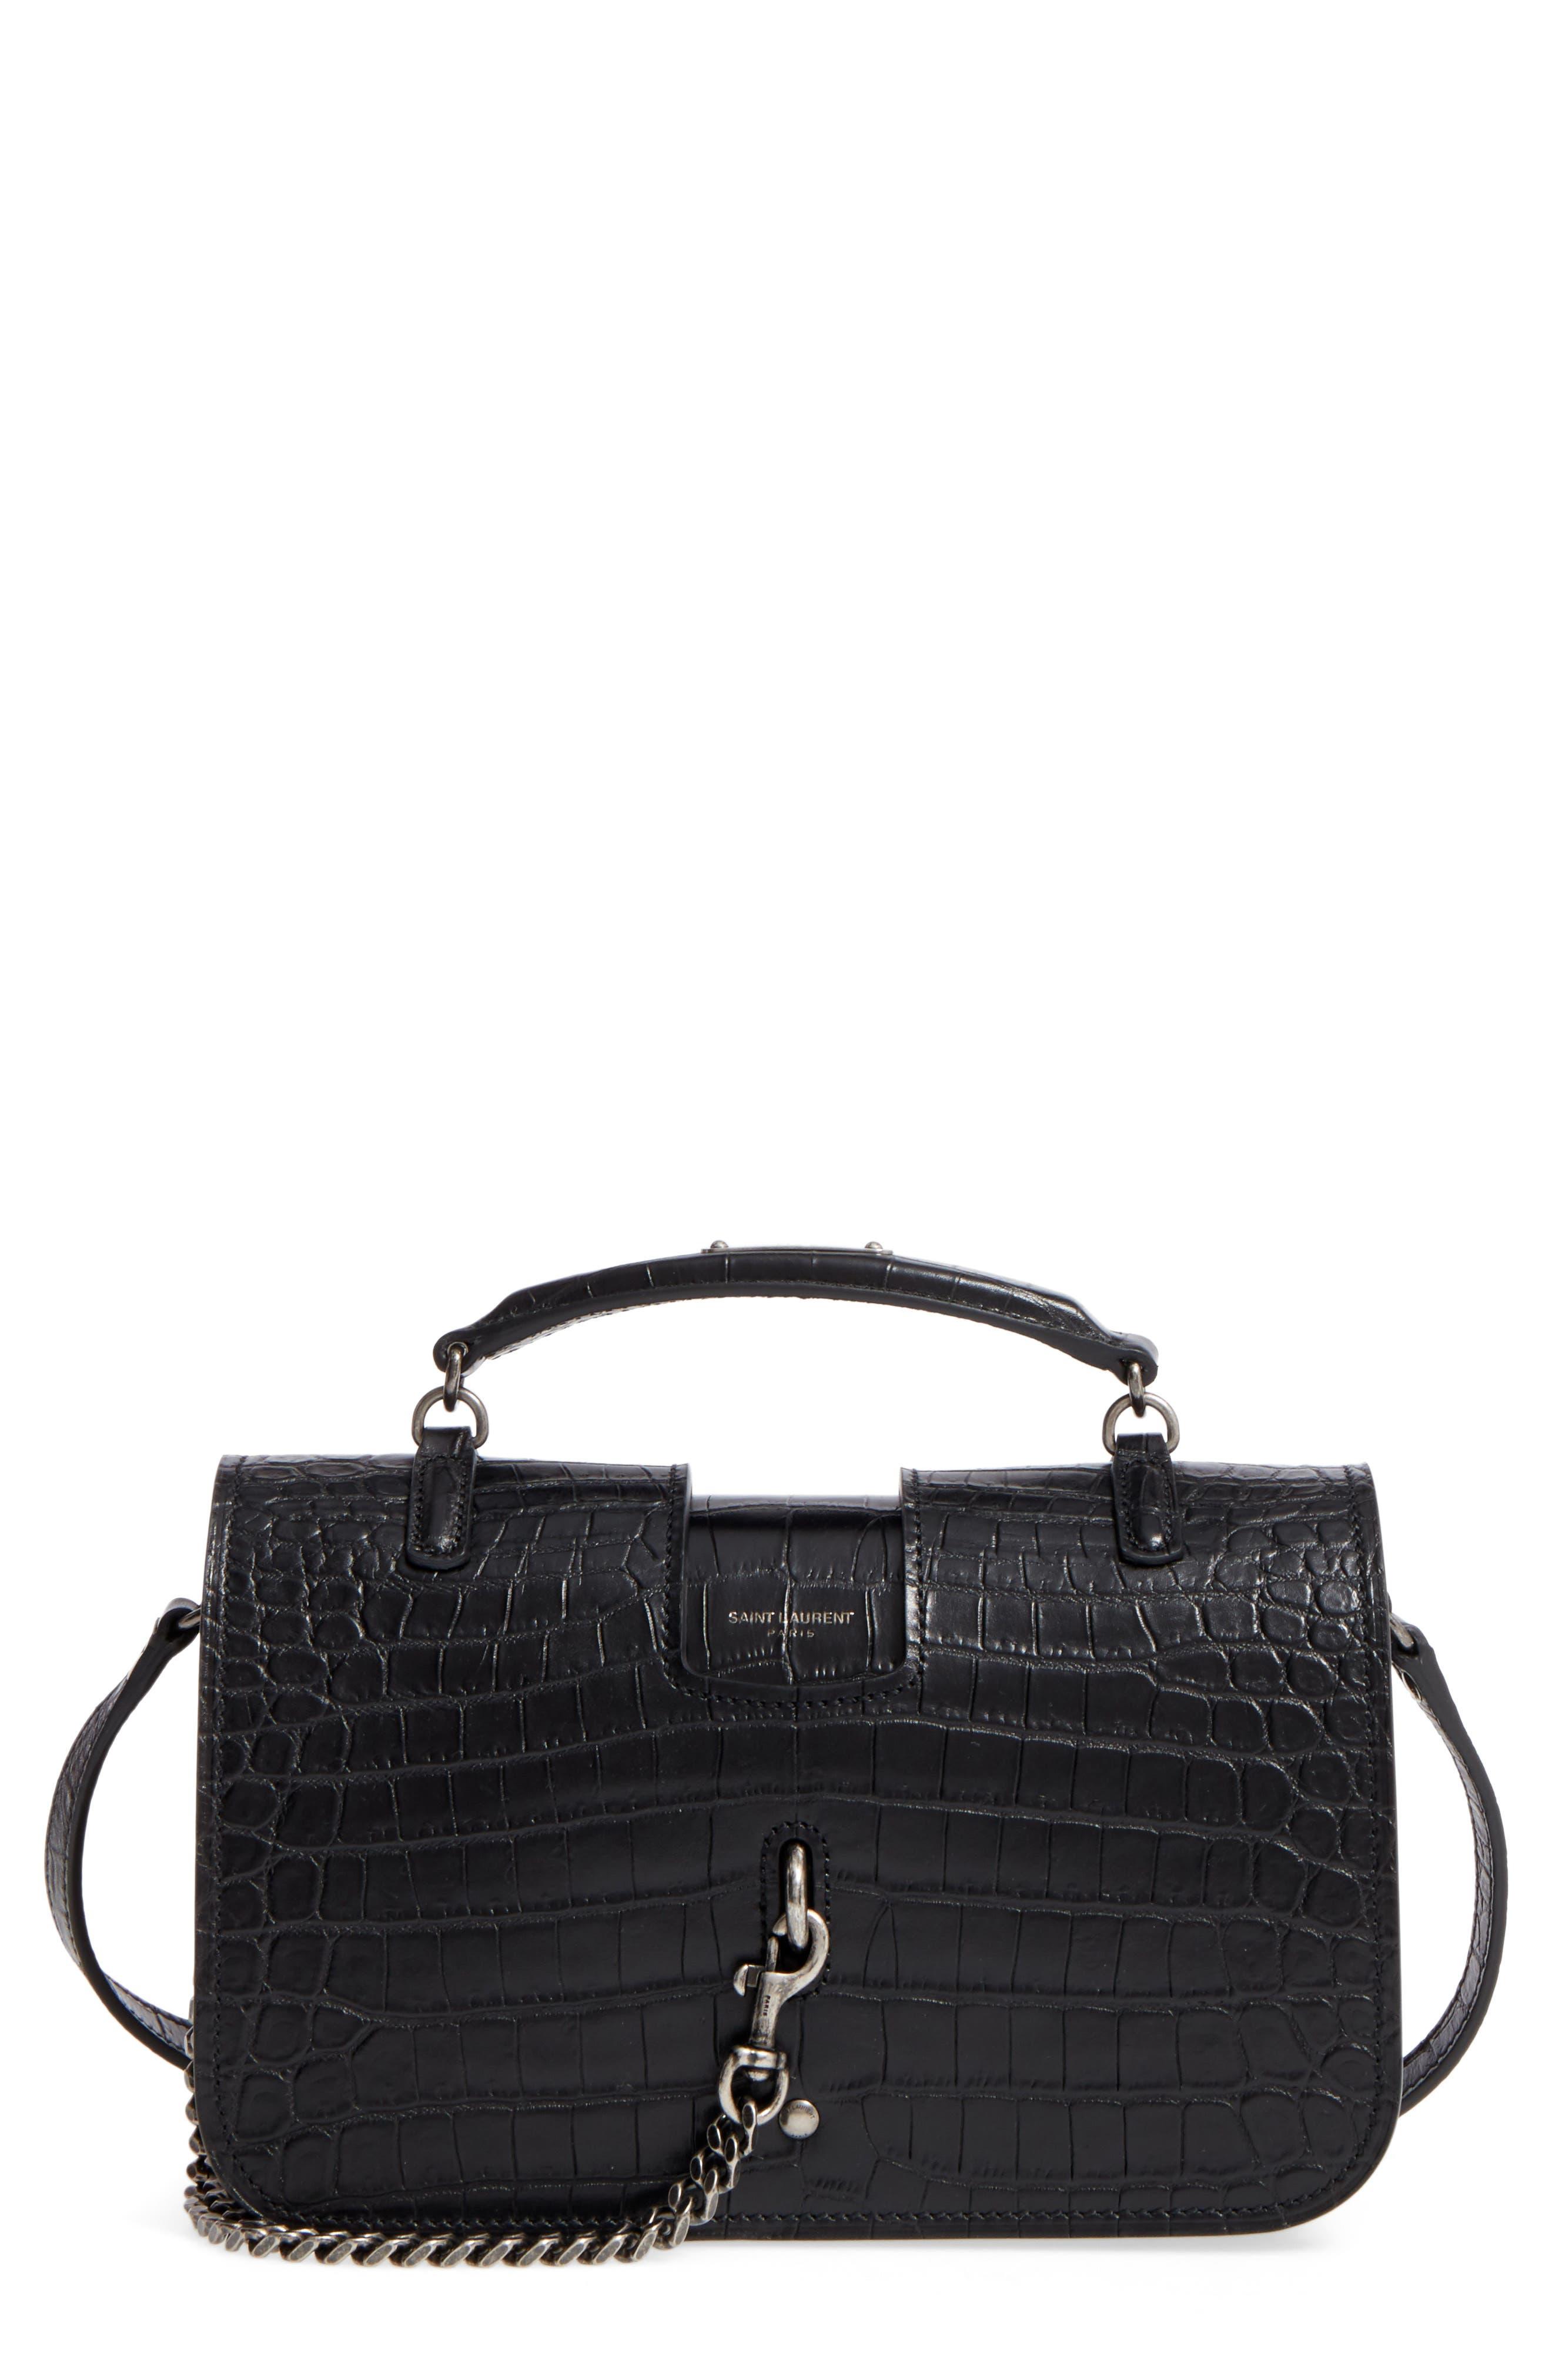 Saint Laurent Croc Embossed Leather Messenger Bag